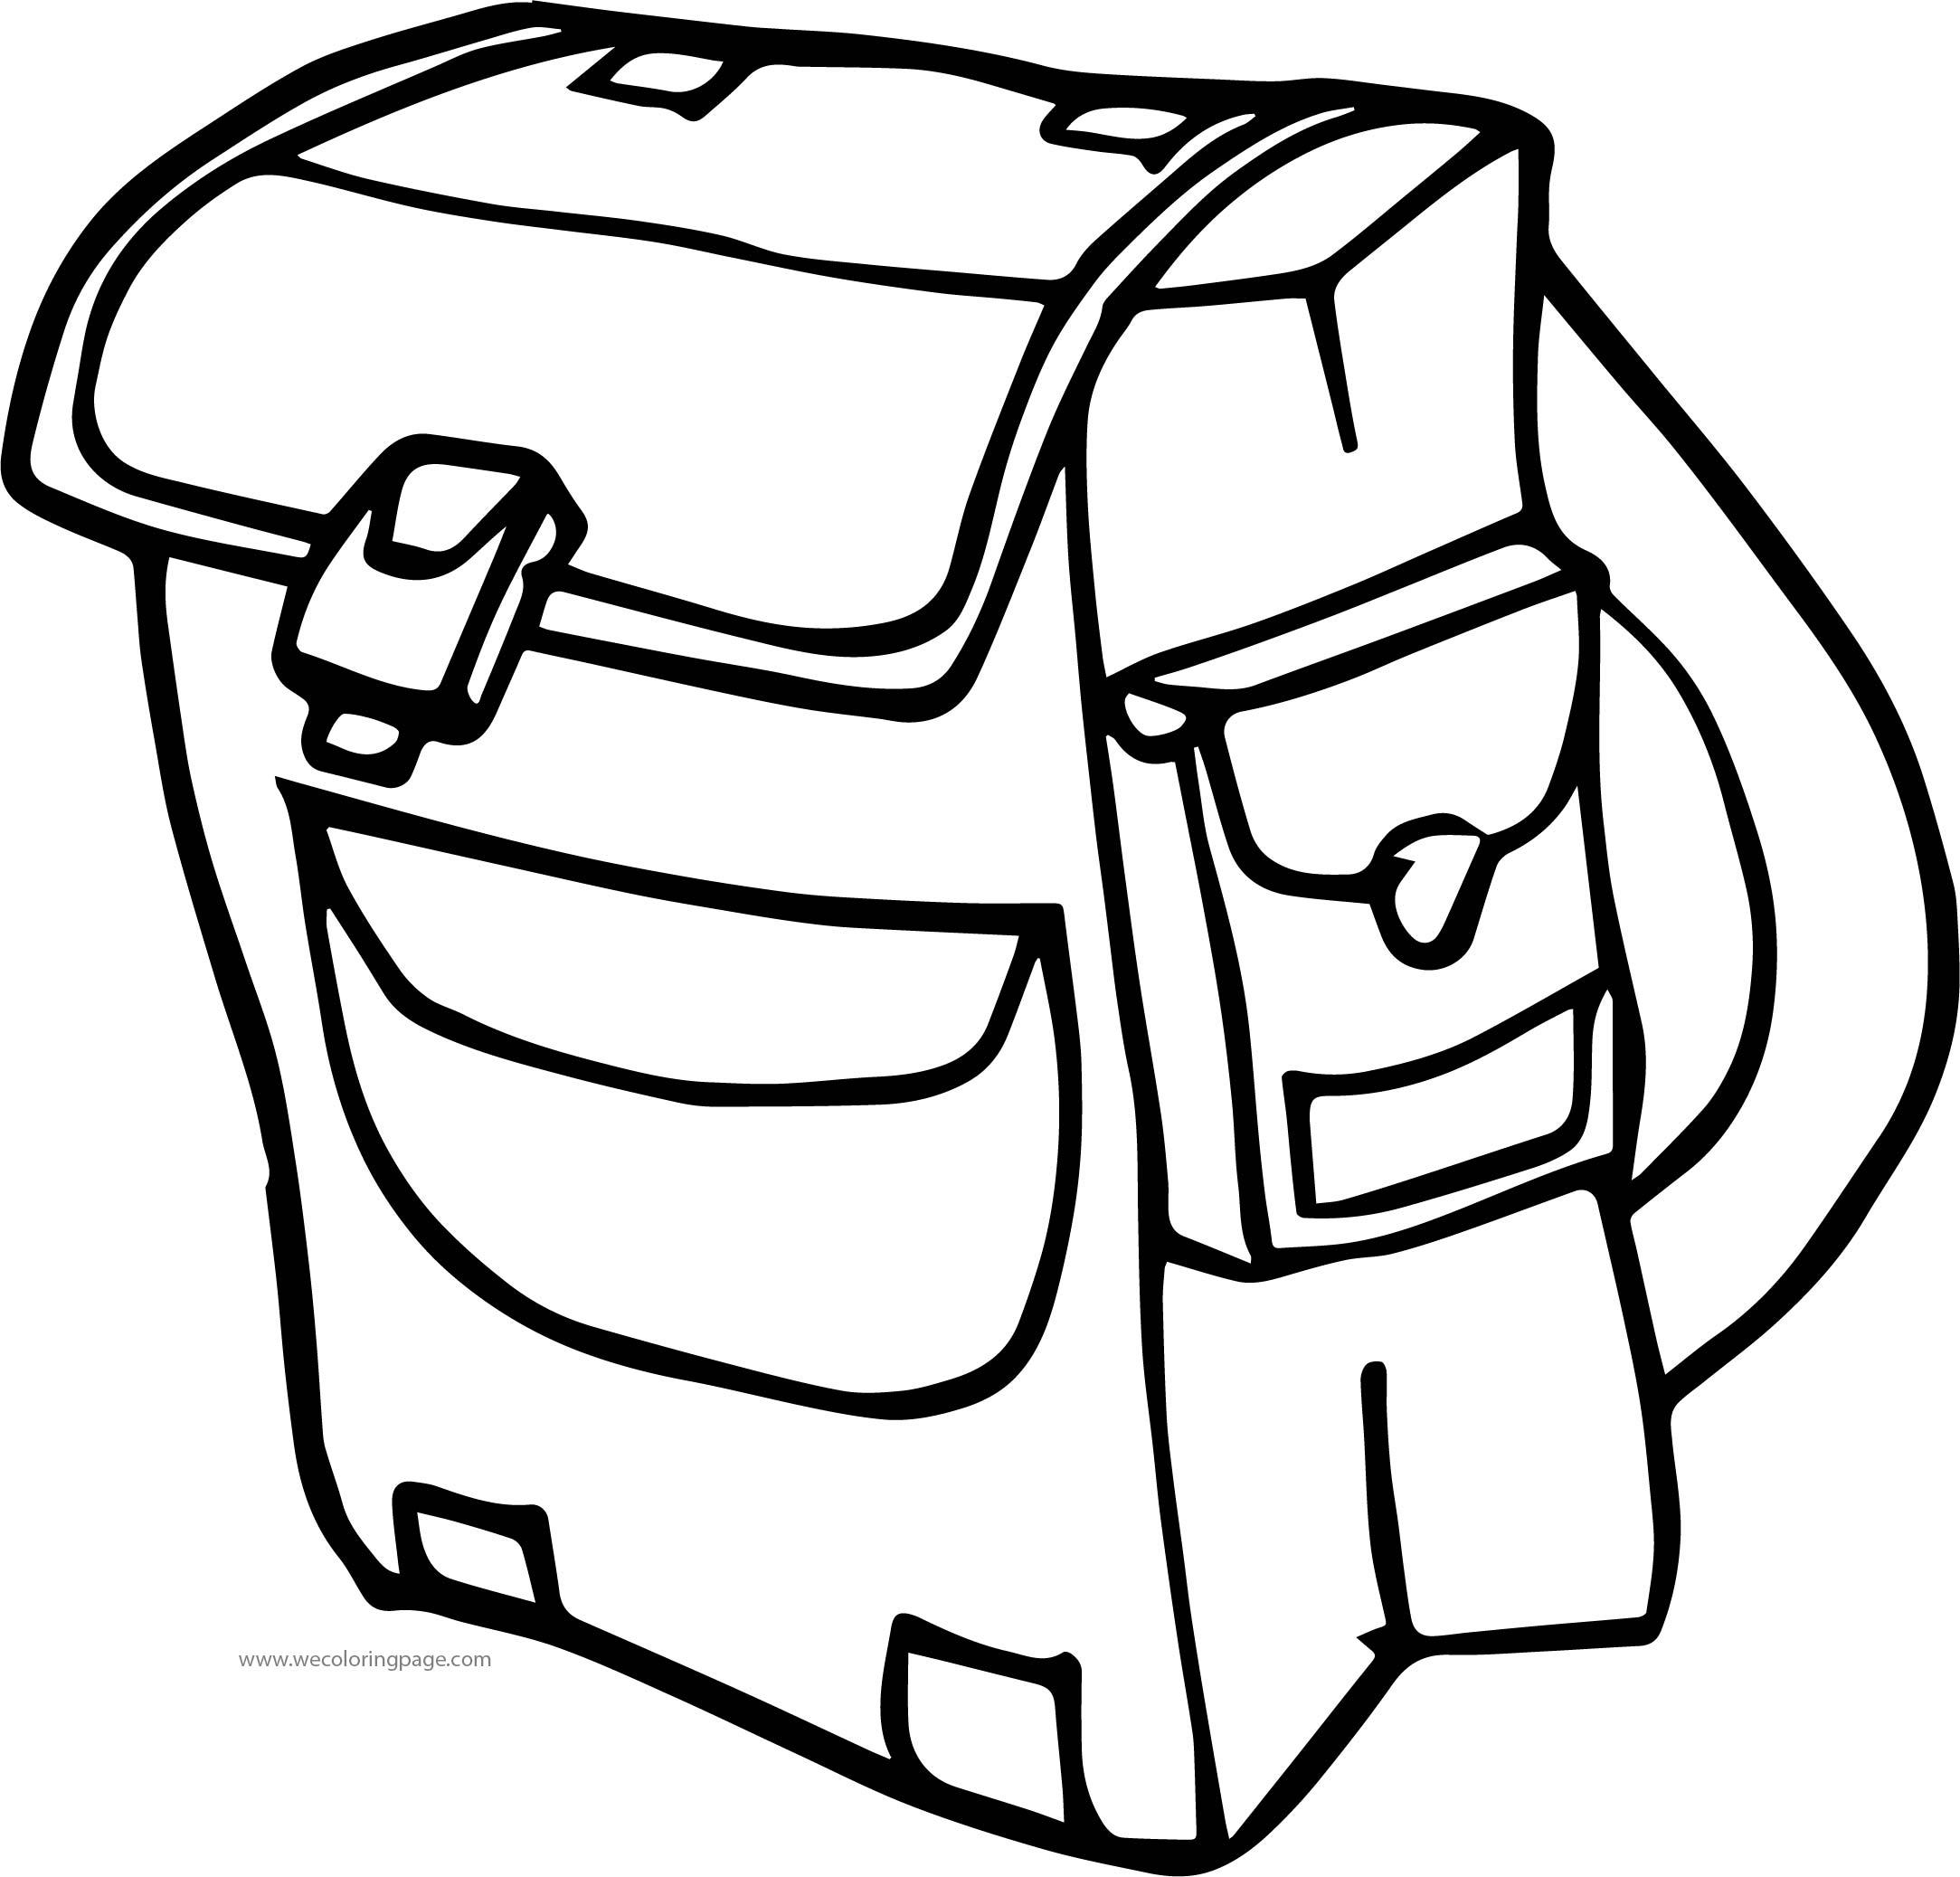 a school bag coloring page wecoloringpage com